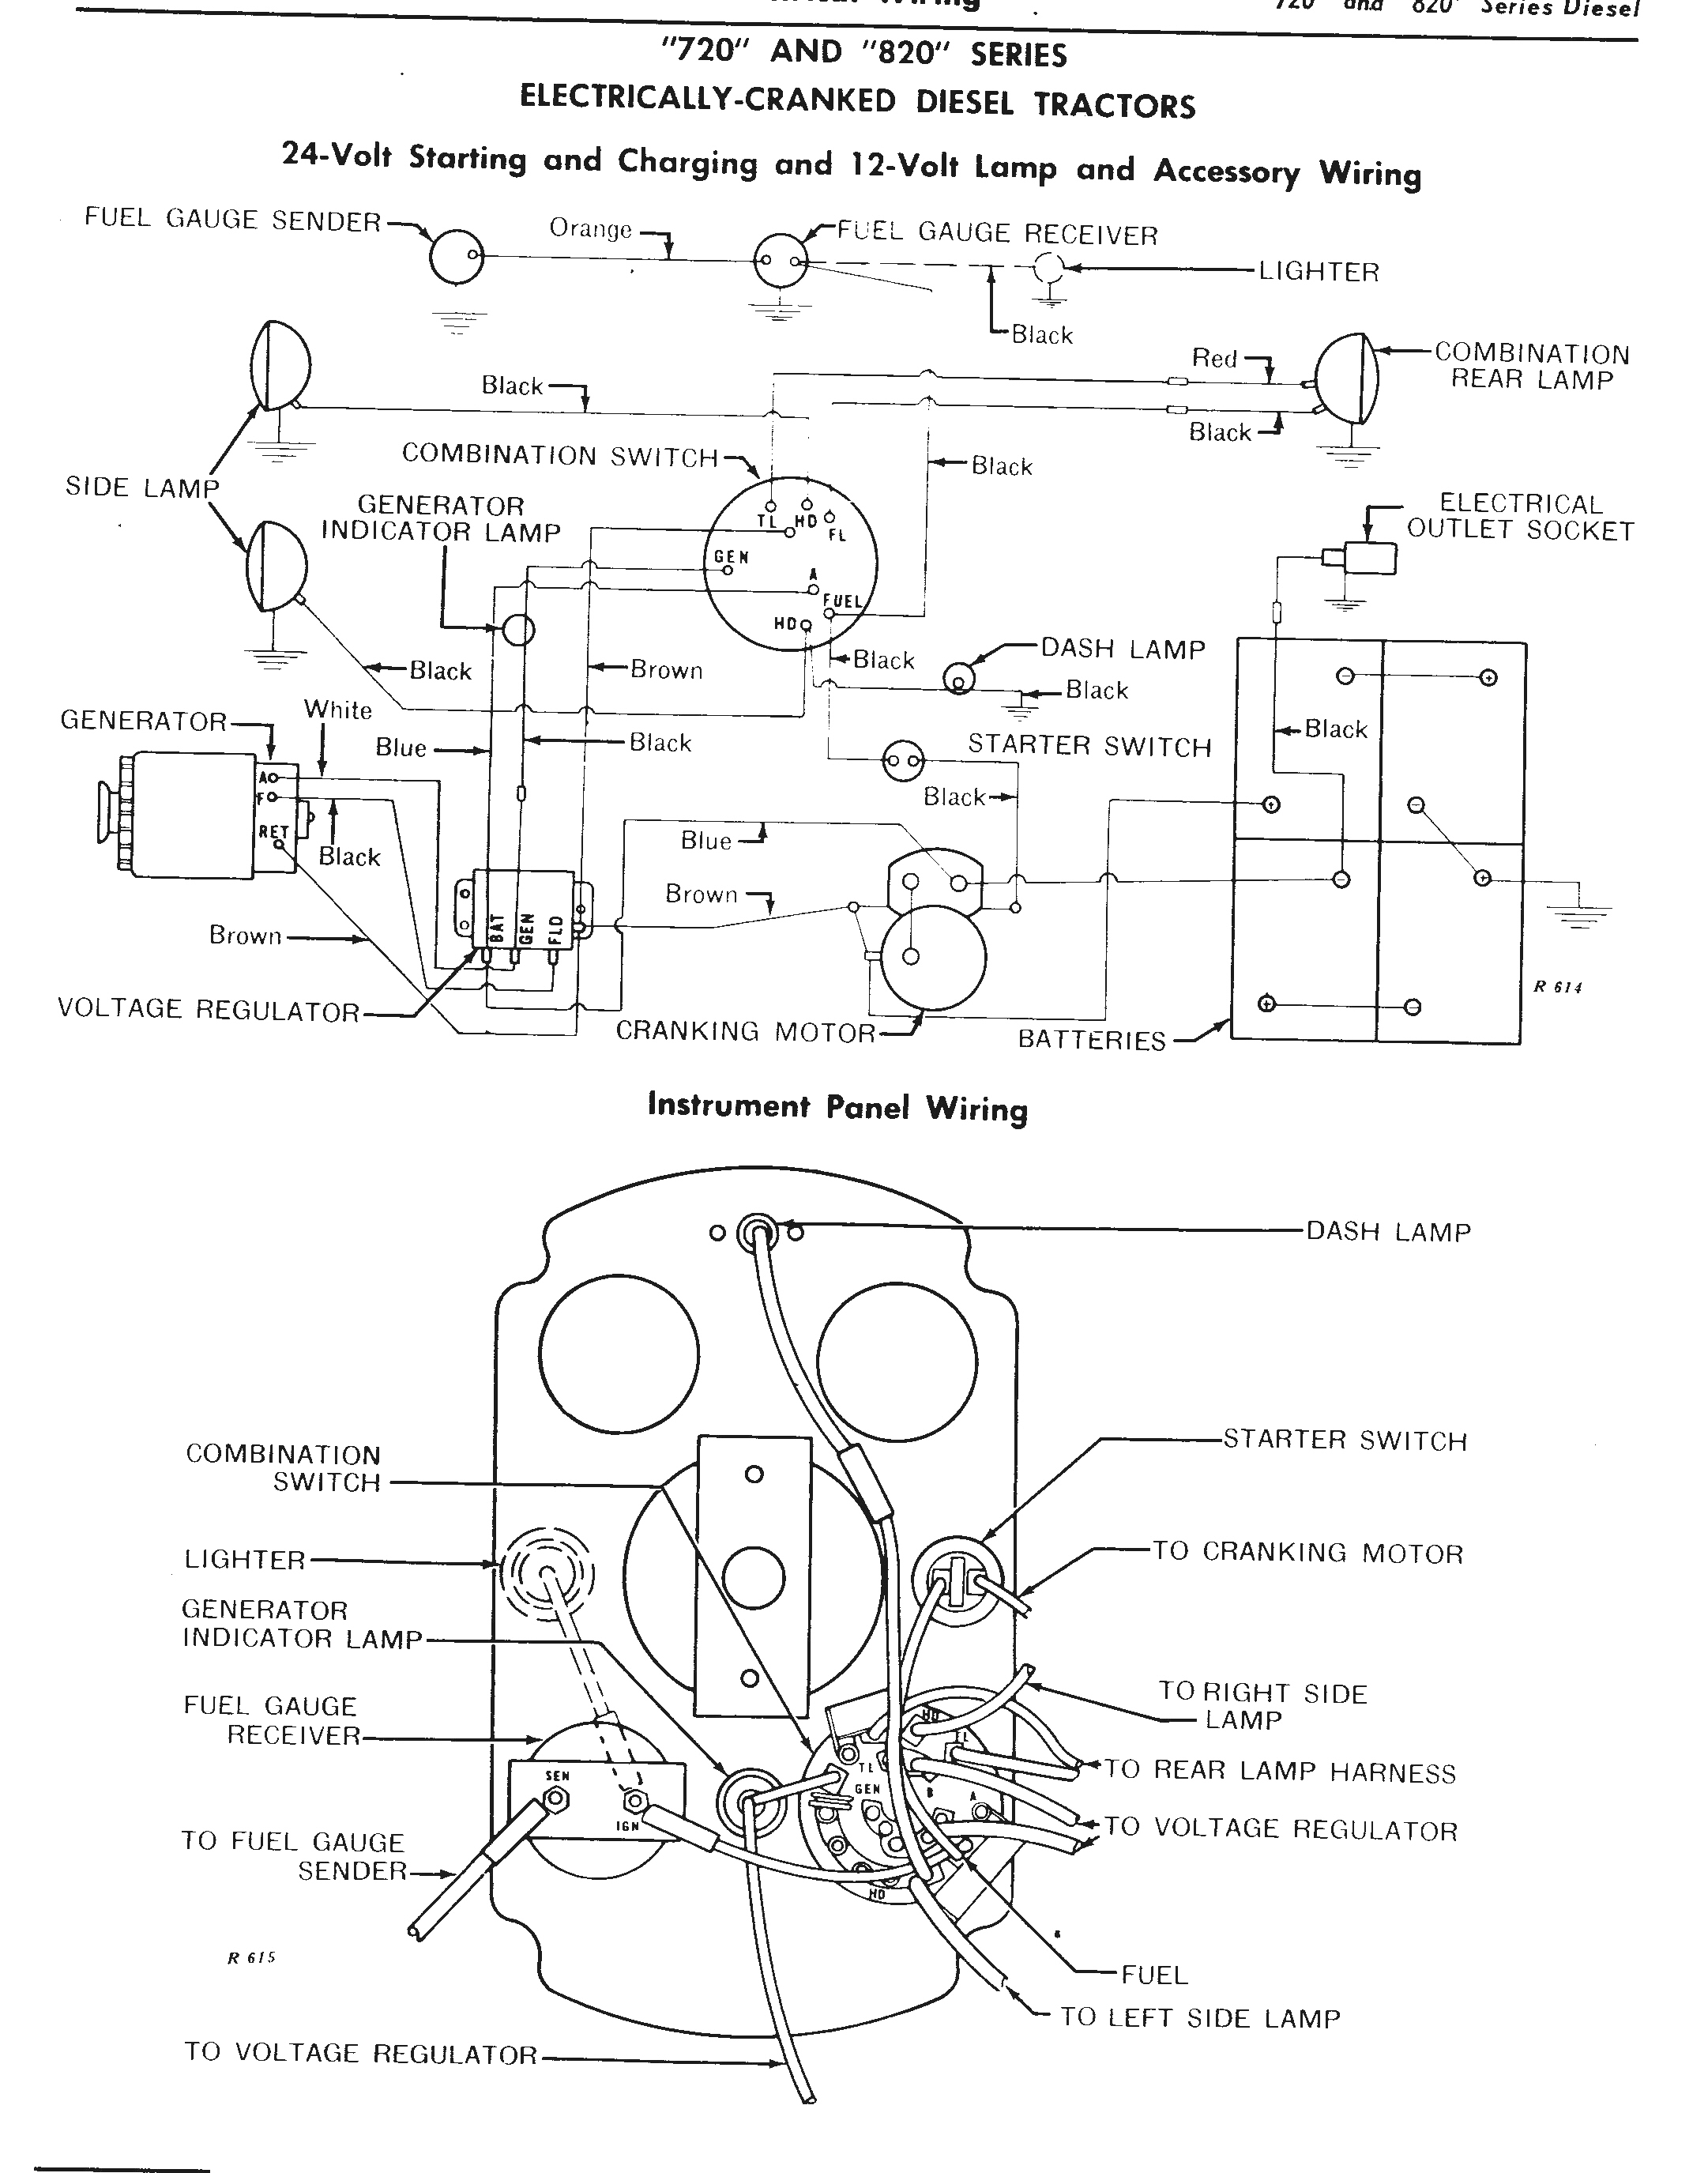 310a wiring diagram data wiring diagrams u2022 rh mikeadkinsguitar com john deere 310sg wiring diagram john deere 310sg wiring diagram